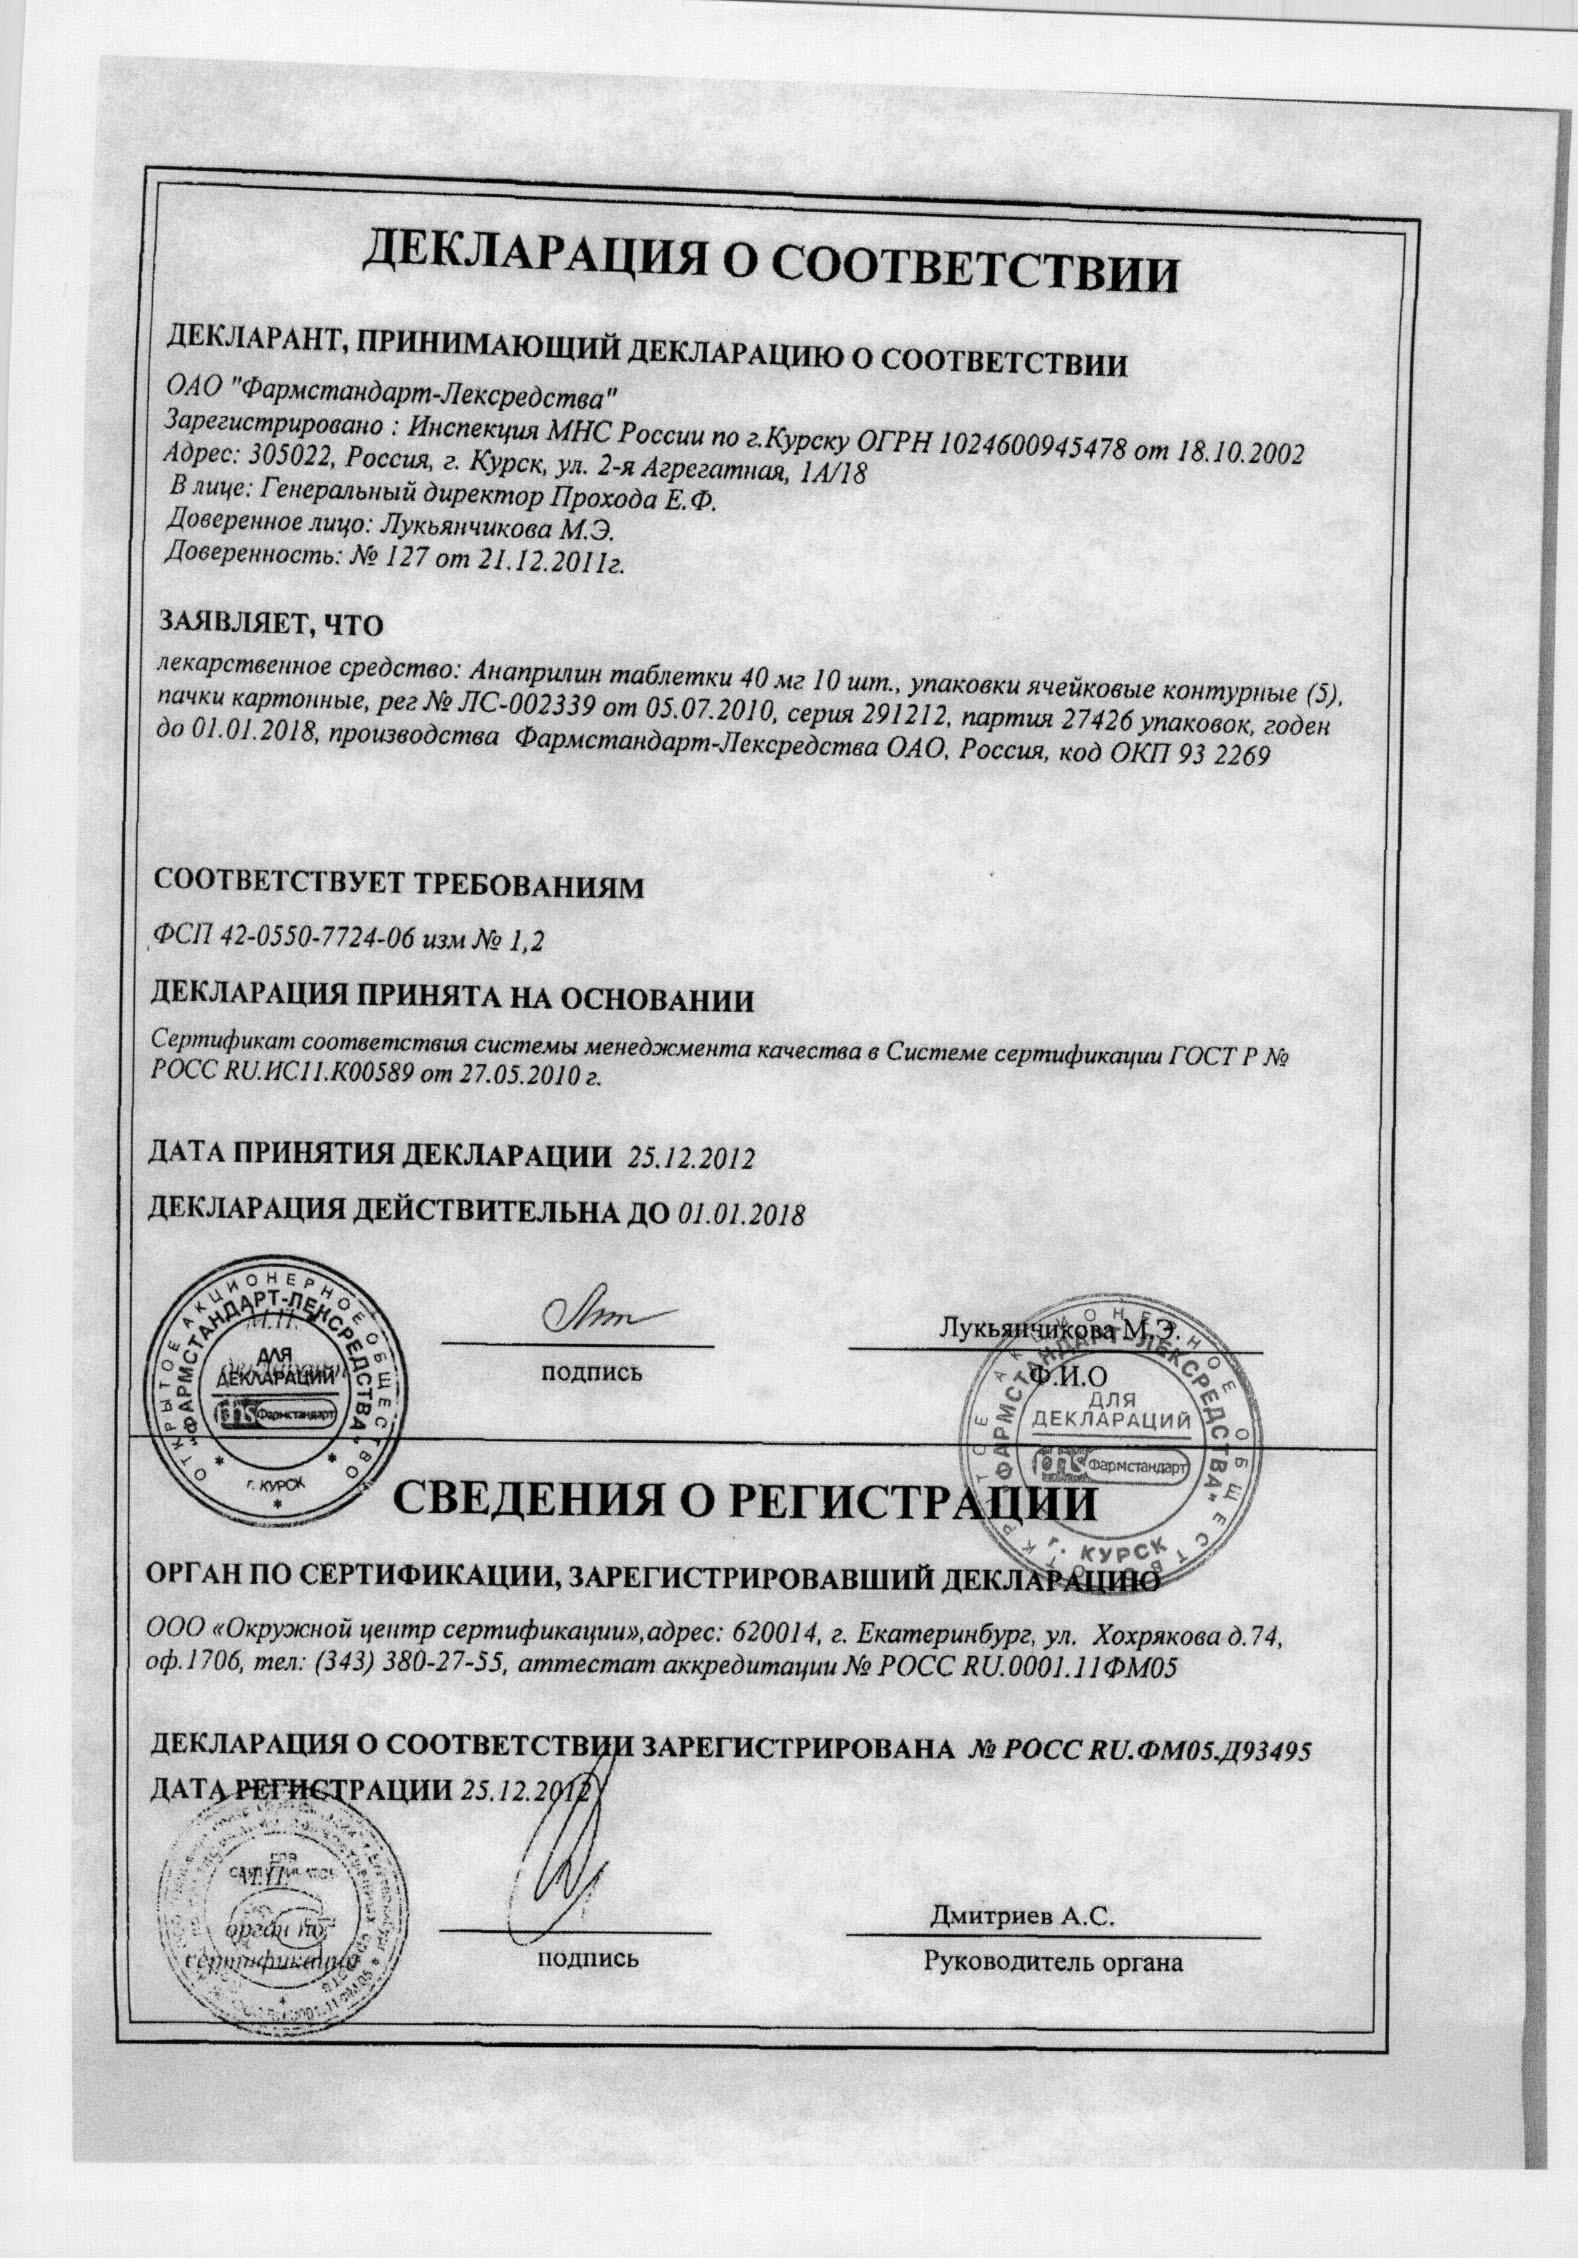 https://avisfarm.com/i/lek/certificates/77721410/23647-00601808.jpg?id=72